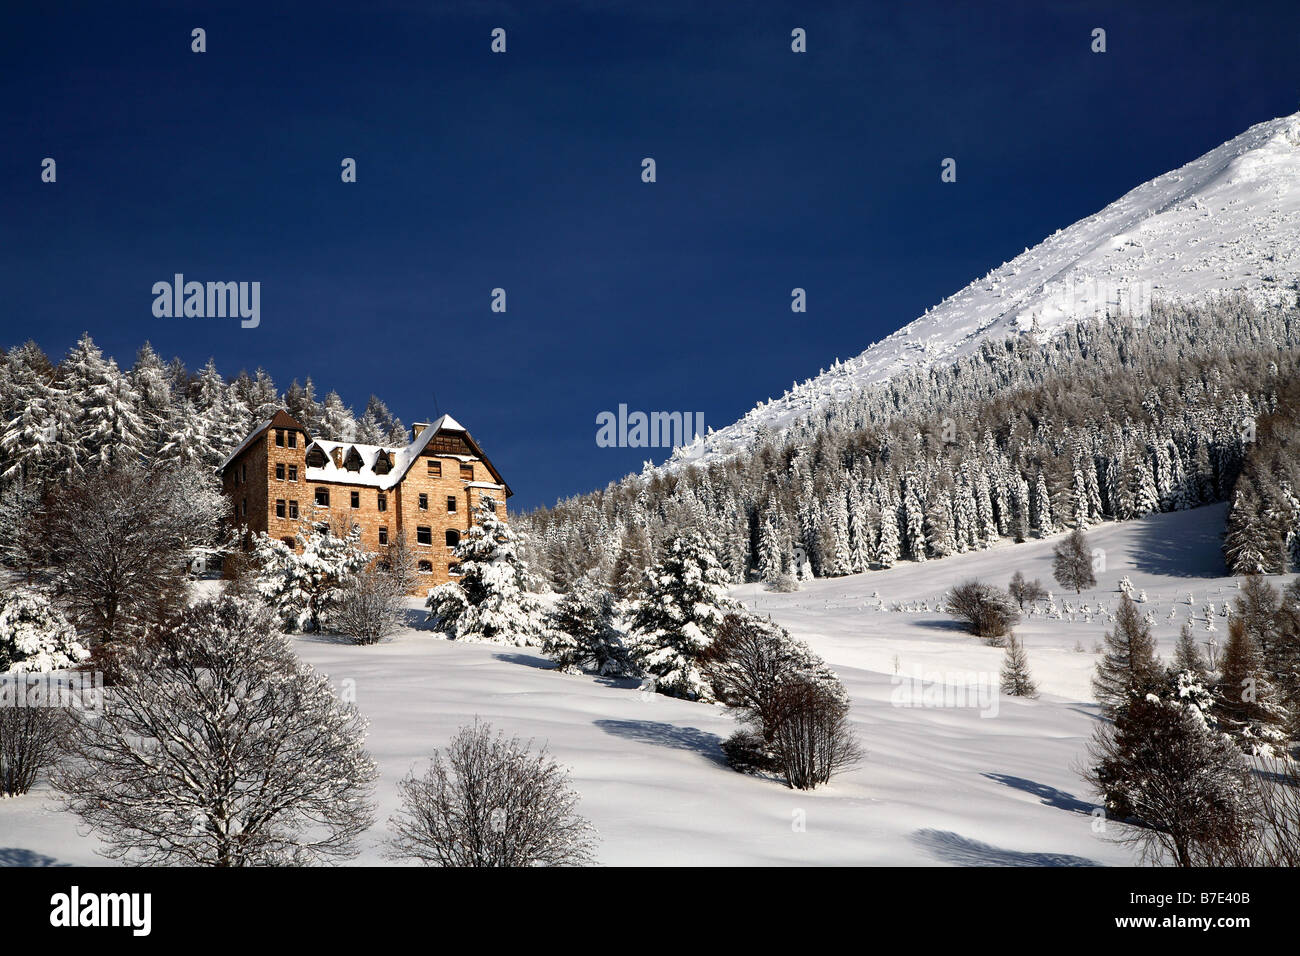 Austro-Hungarian barracks, Piana delle Viote, Bondone mountain, Trentino Alto Adige, Italy - Stock Image